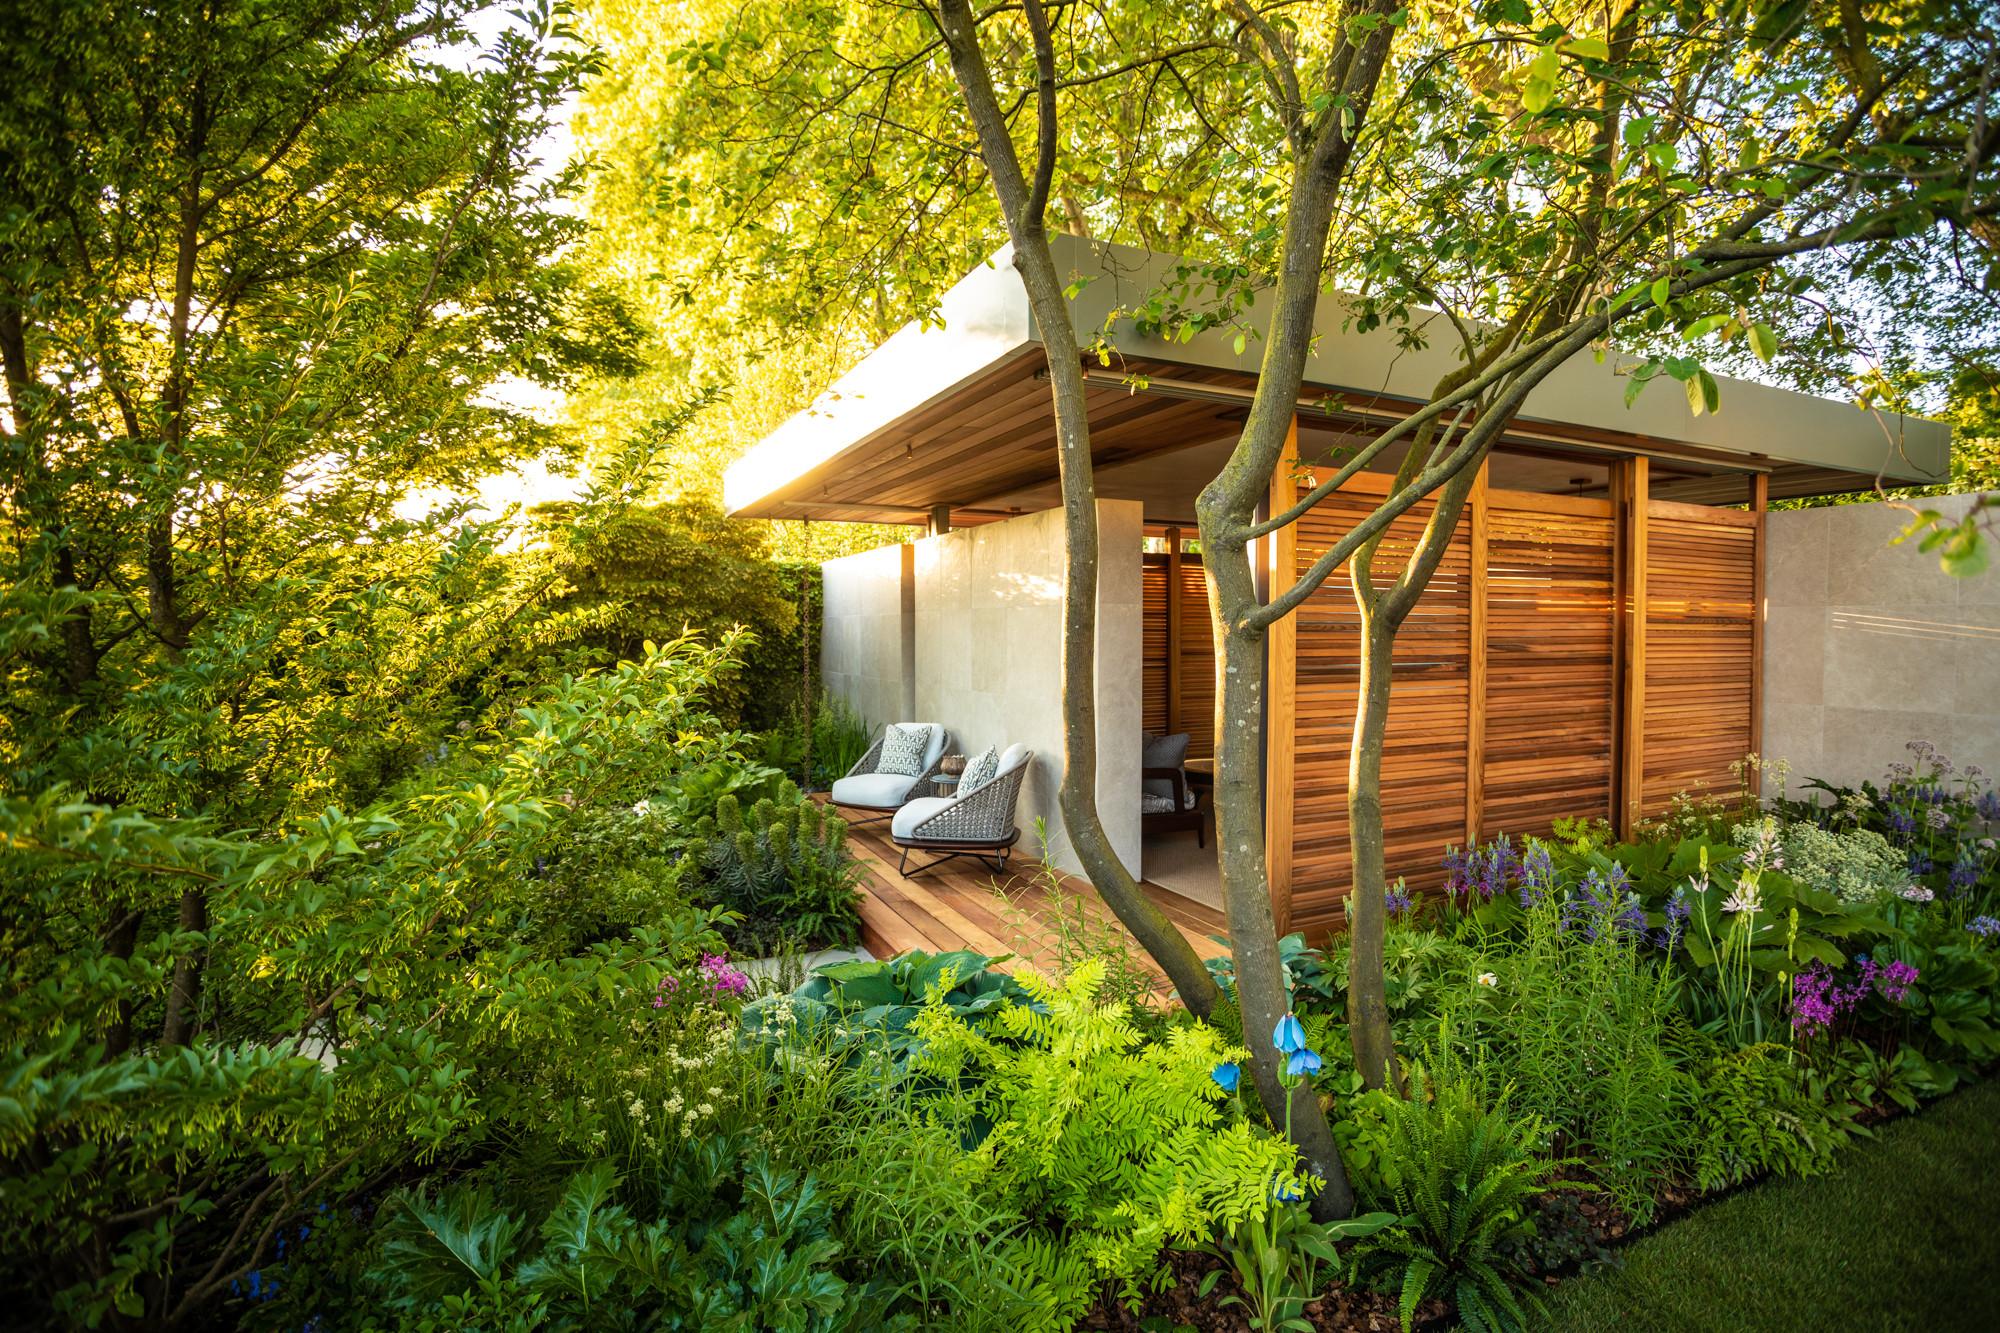 chris beardshaw, garden design, planting design, landscape design